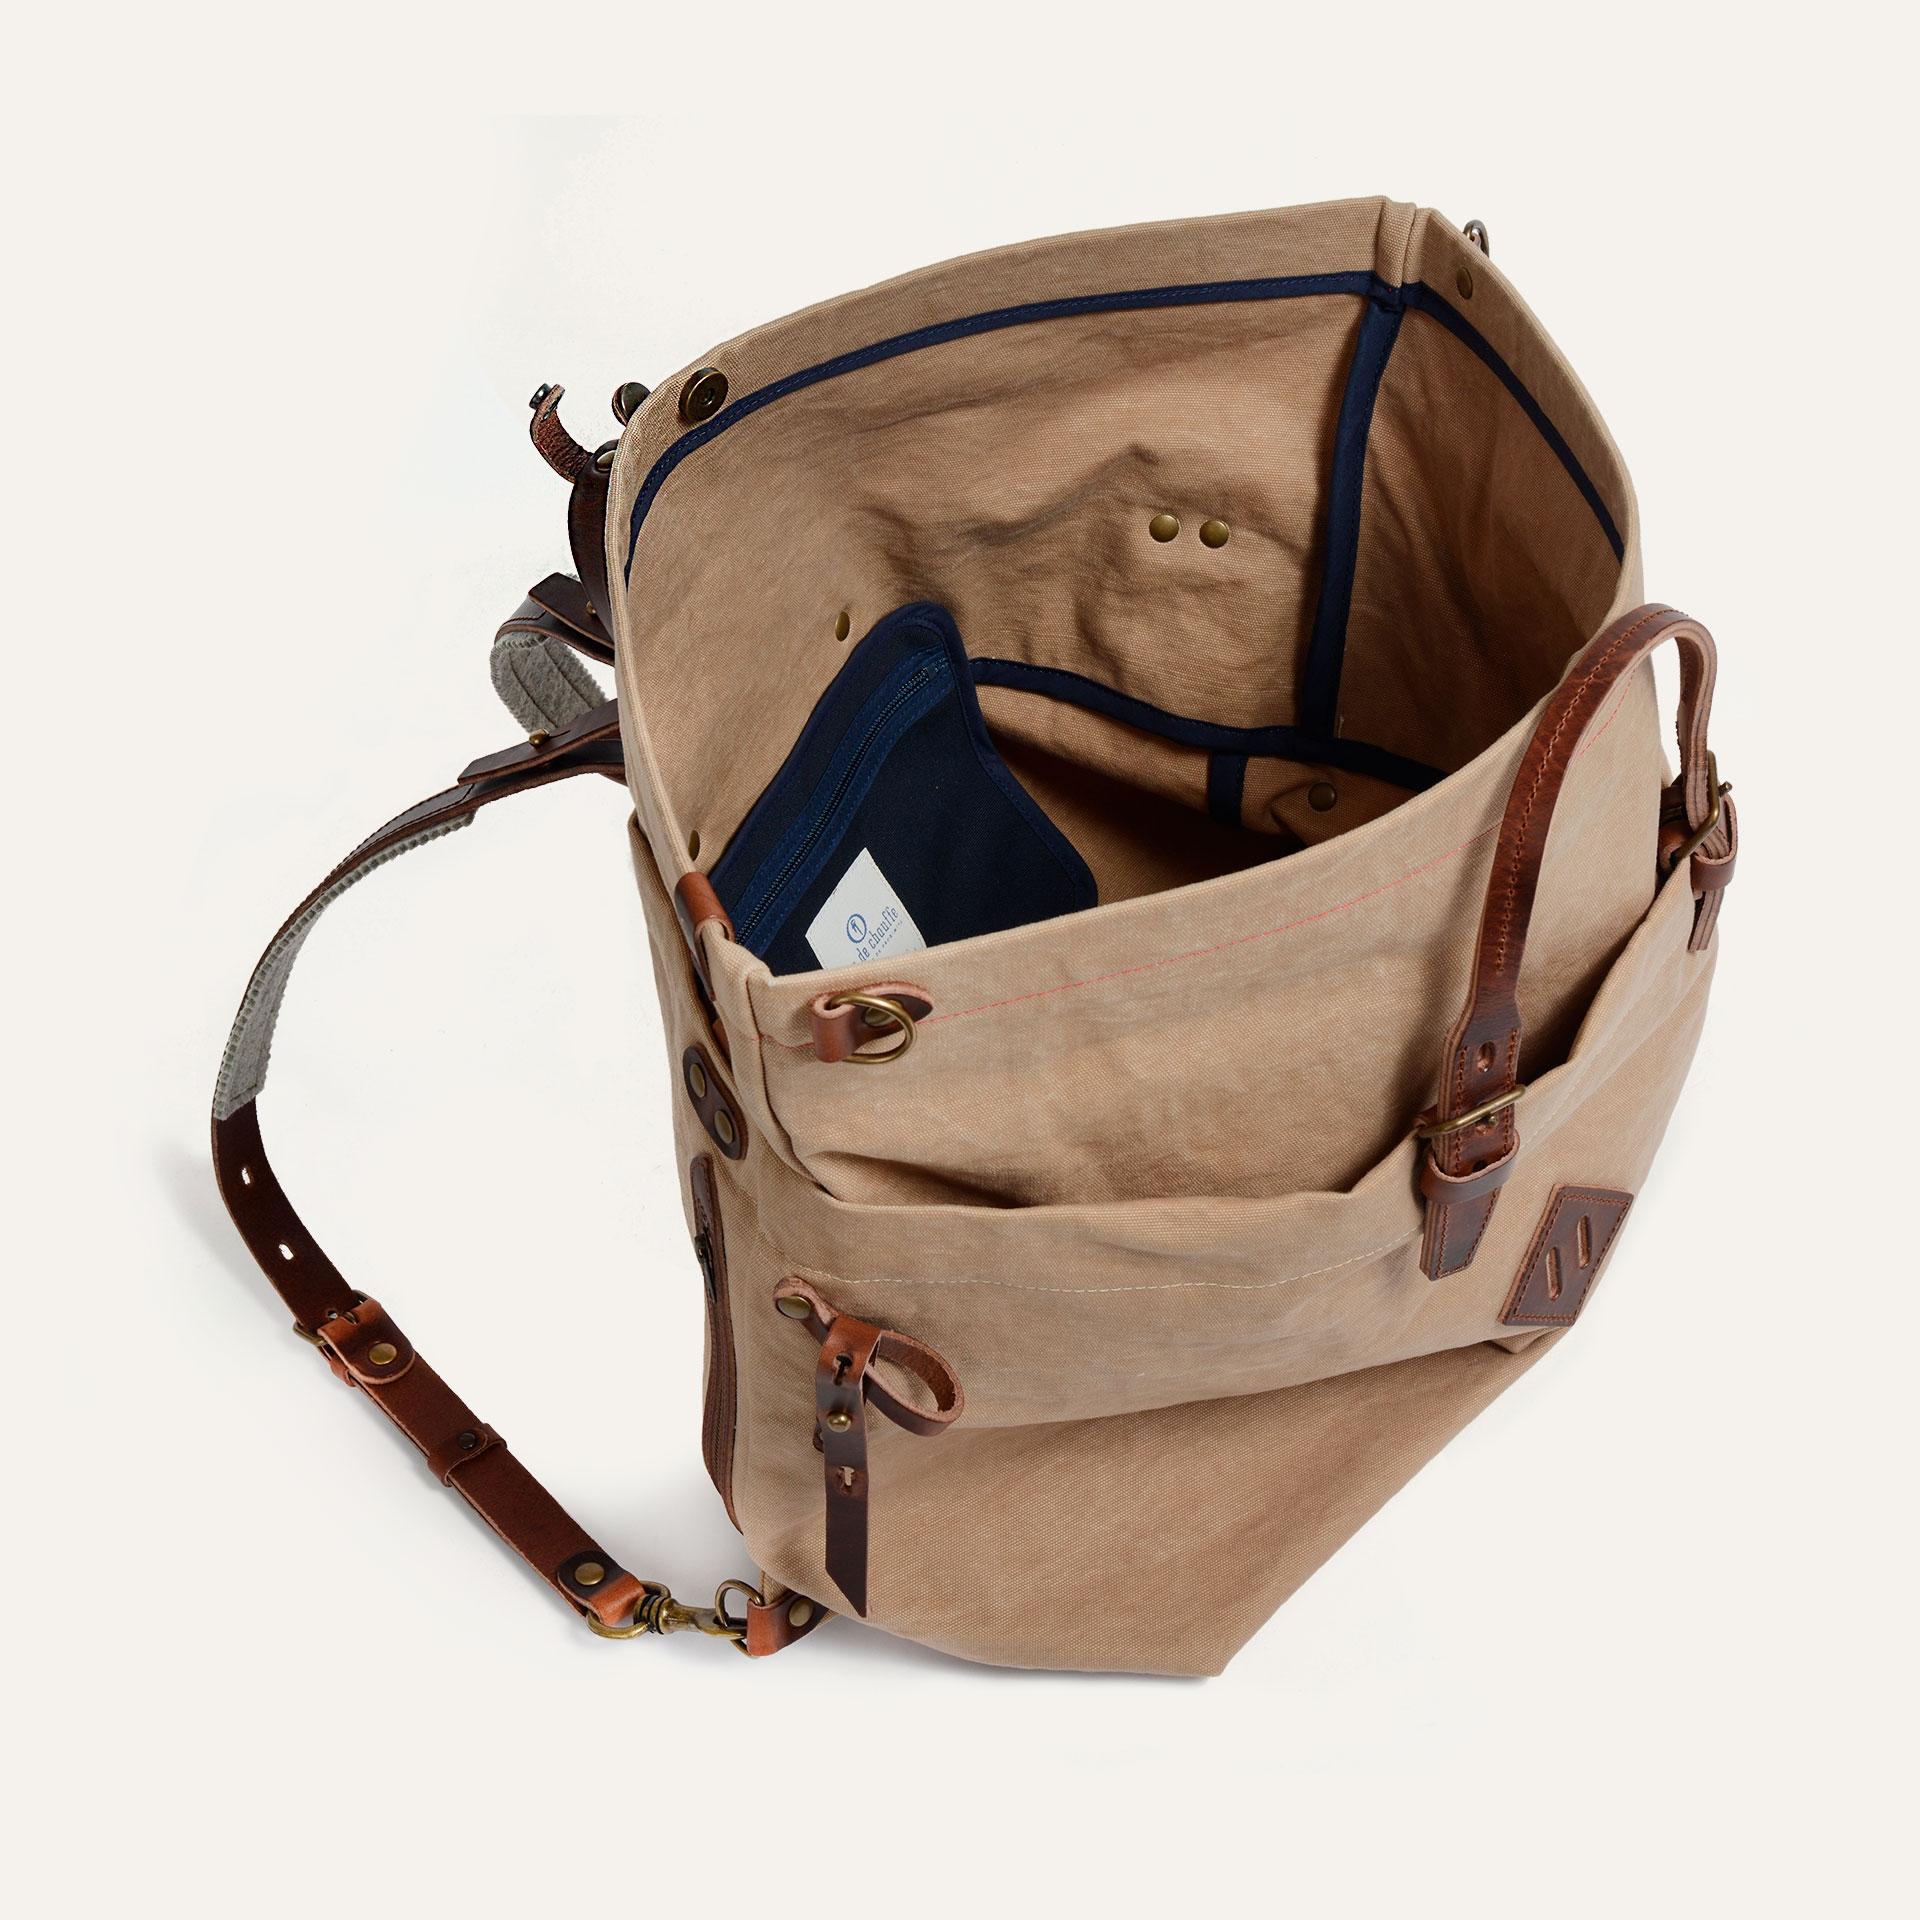 Woody L Backpack - Wheat  (image n°4)